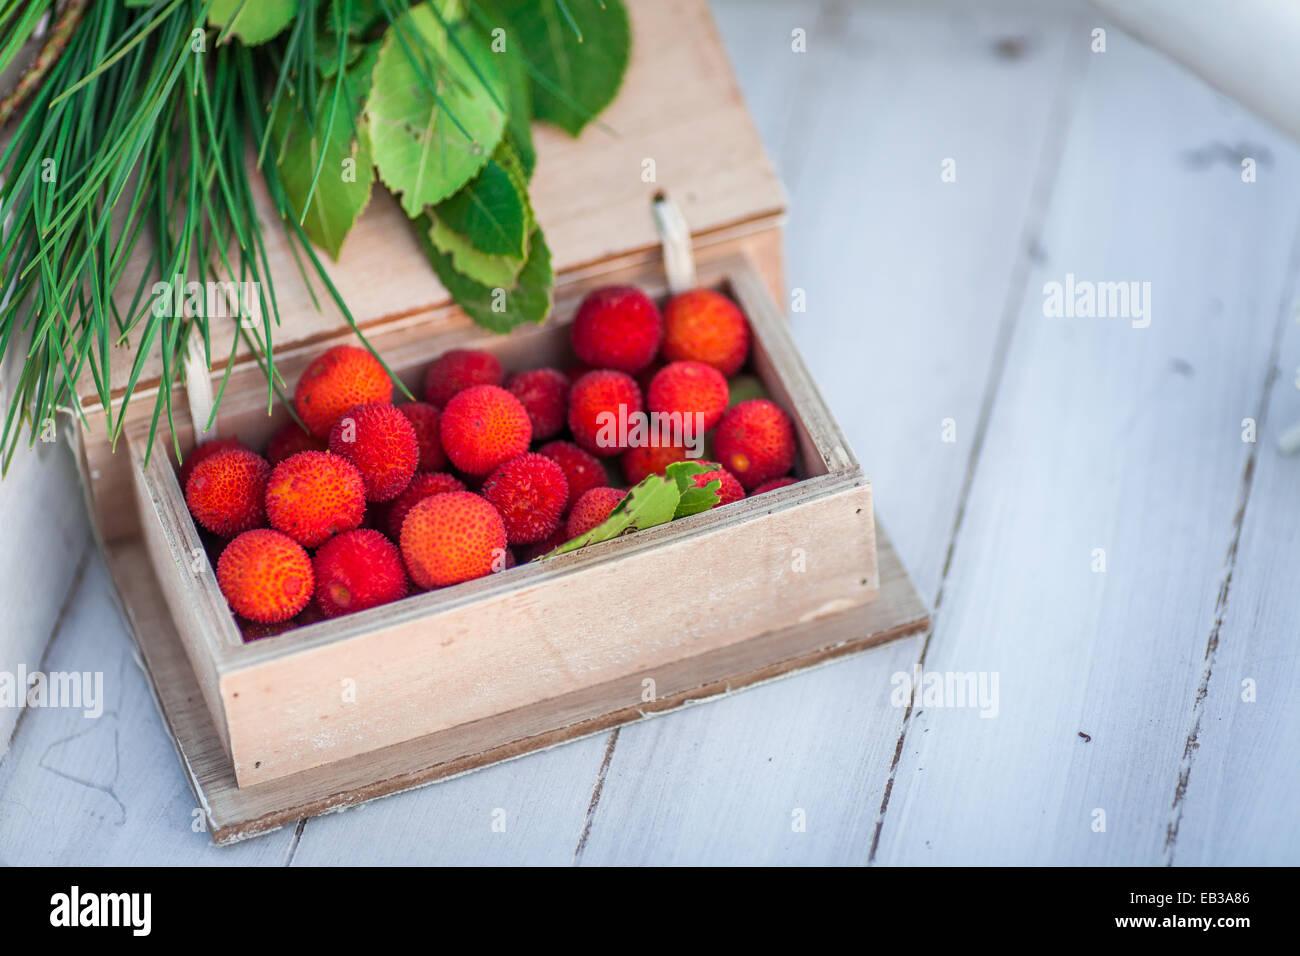 Holzkiste Lychee Früchte Stockbild